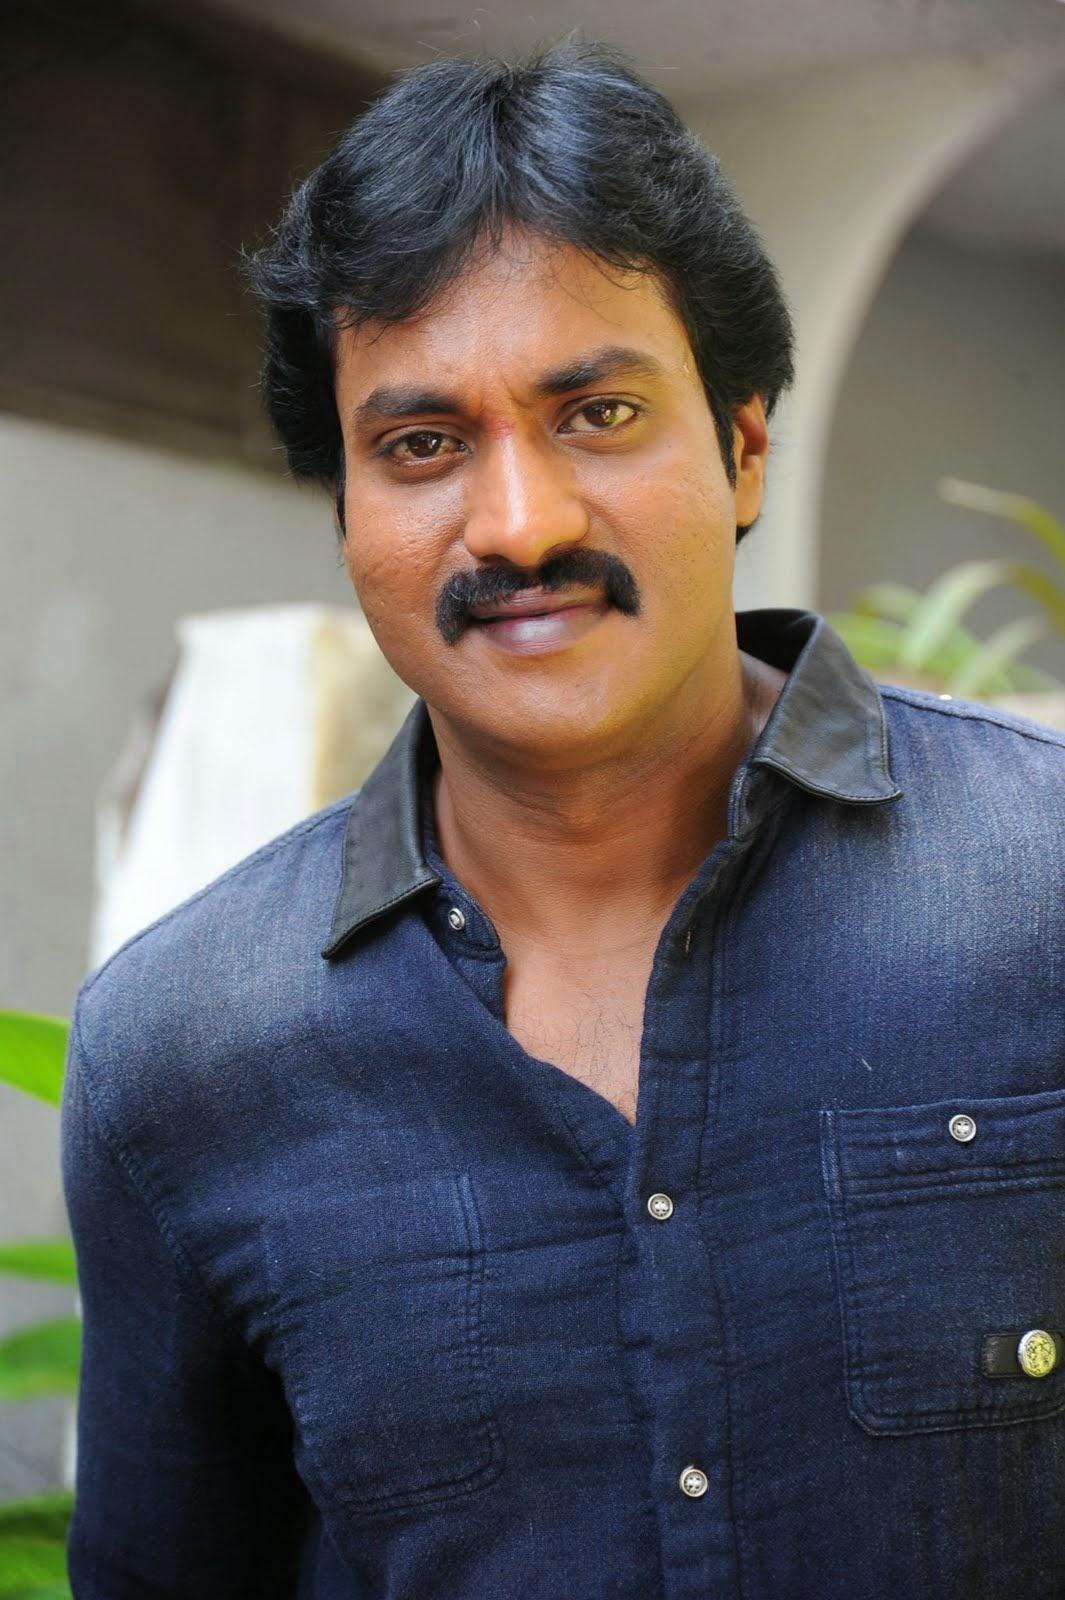 Sunil-New-movie-images